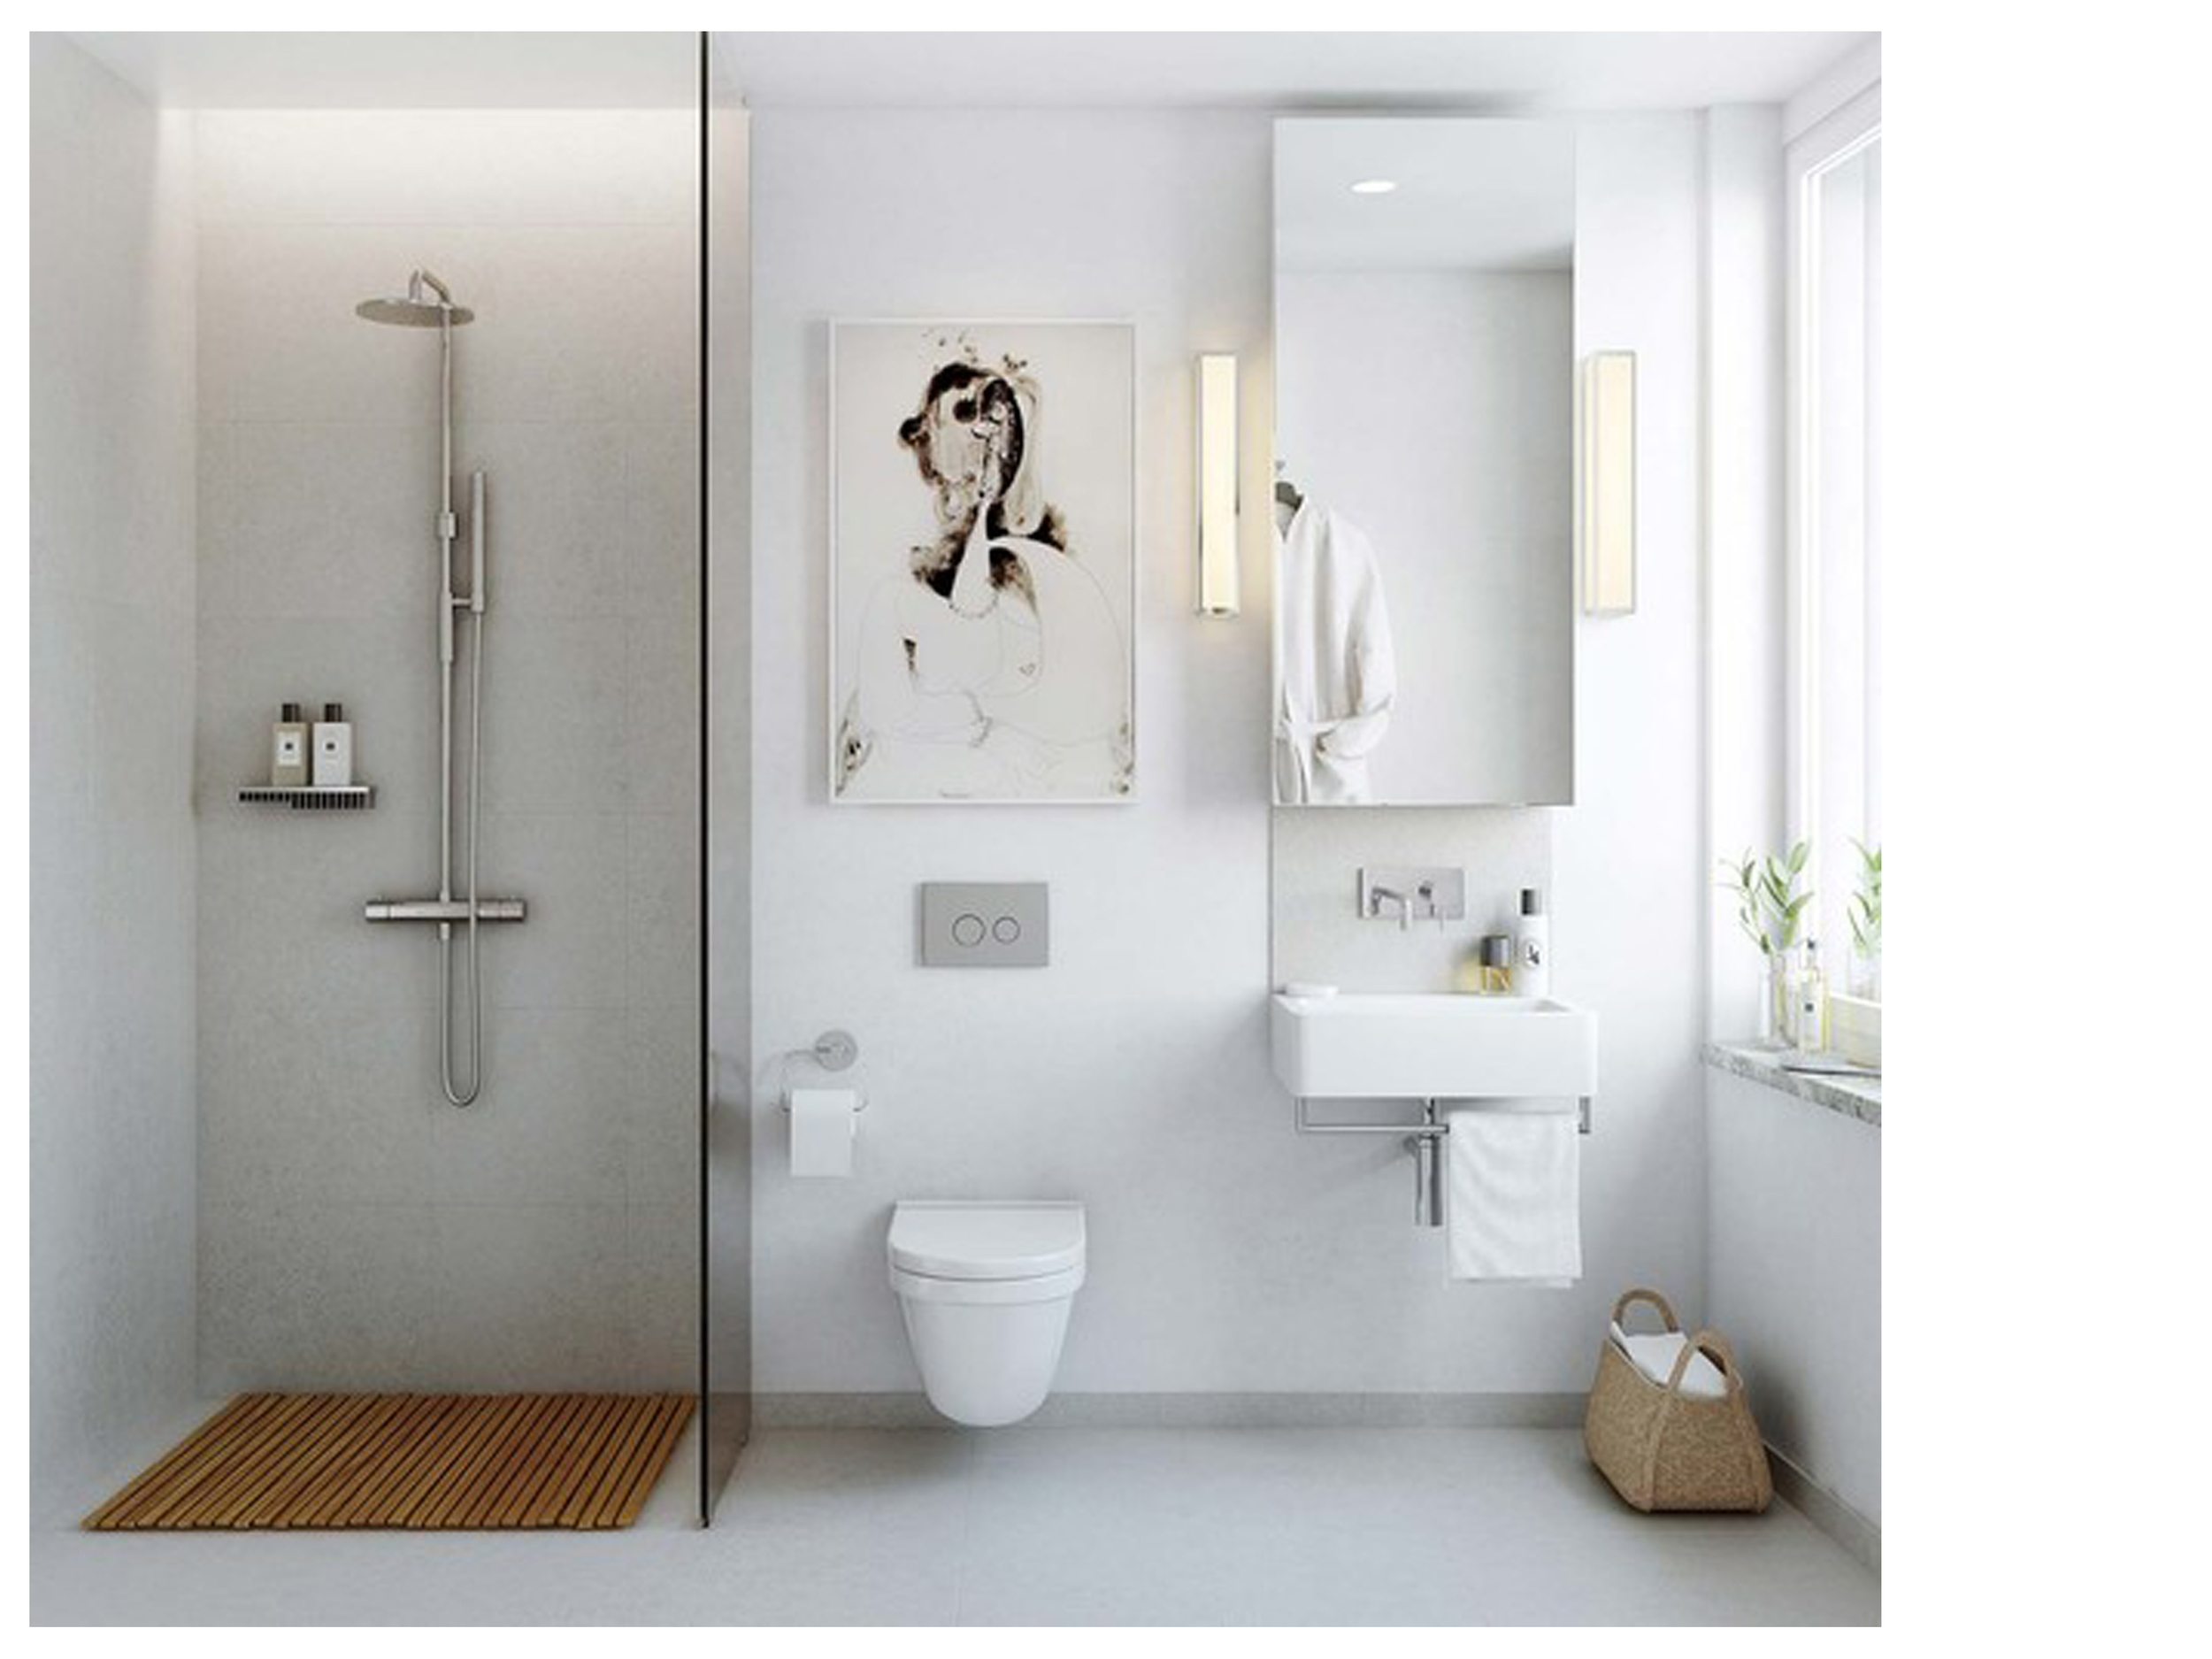 11 Bath Spread 3.jpg